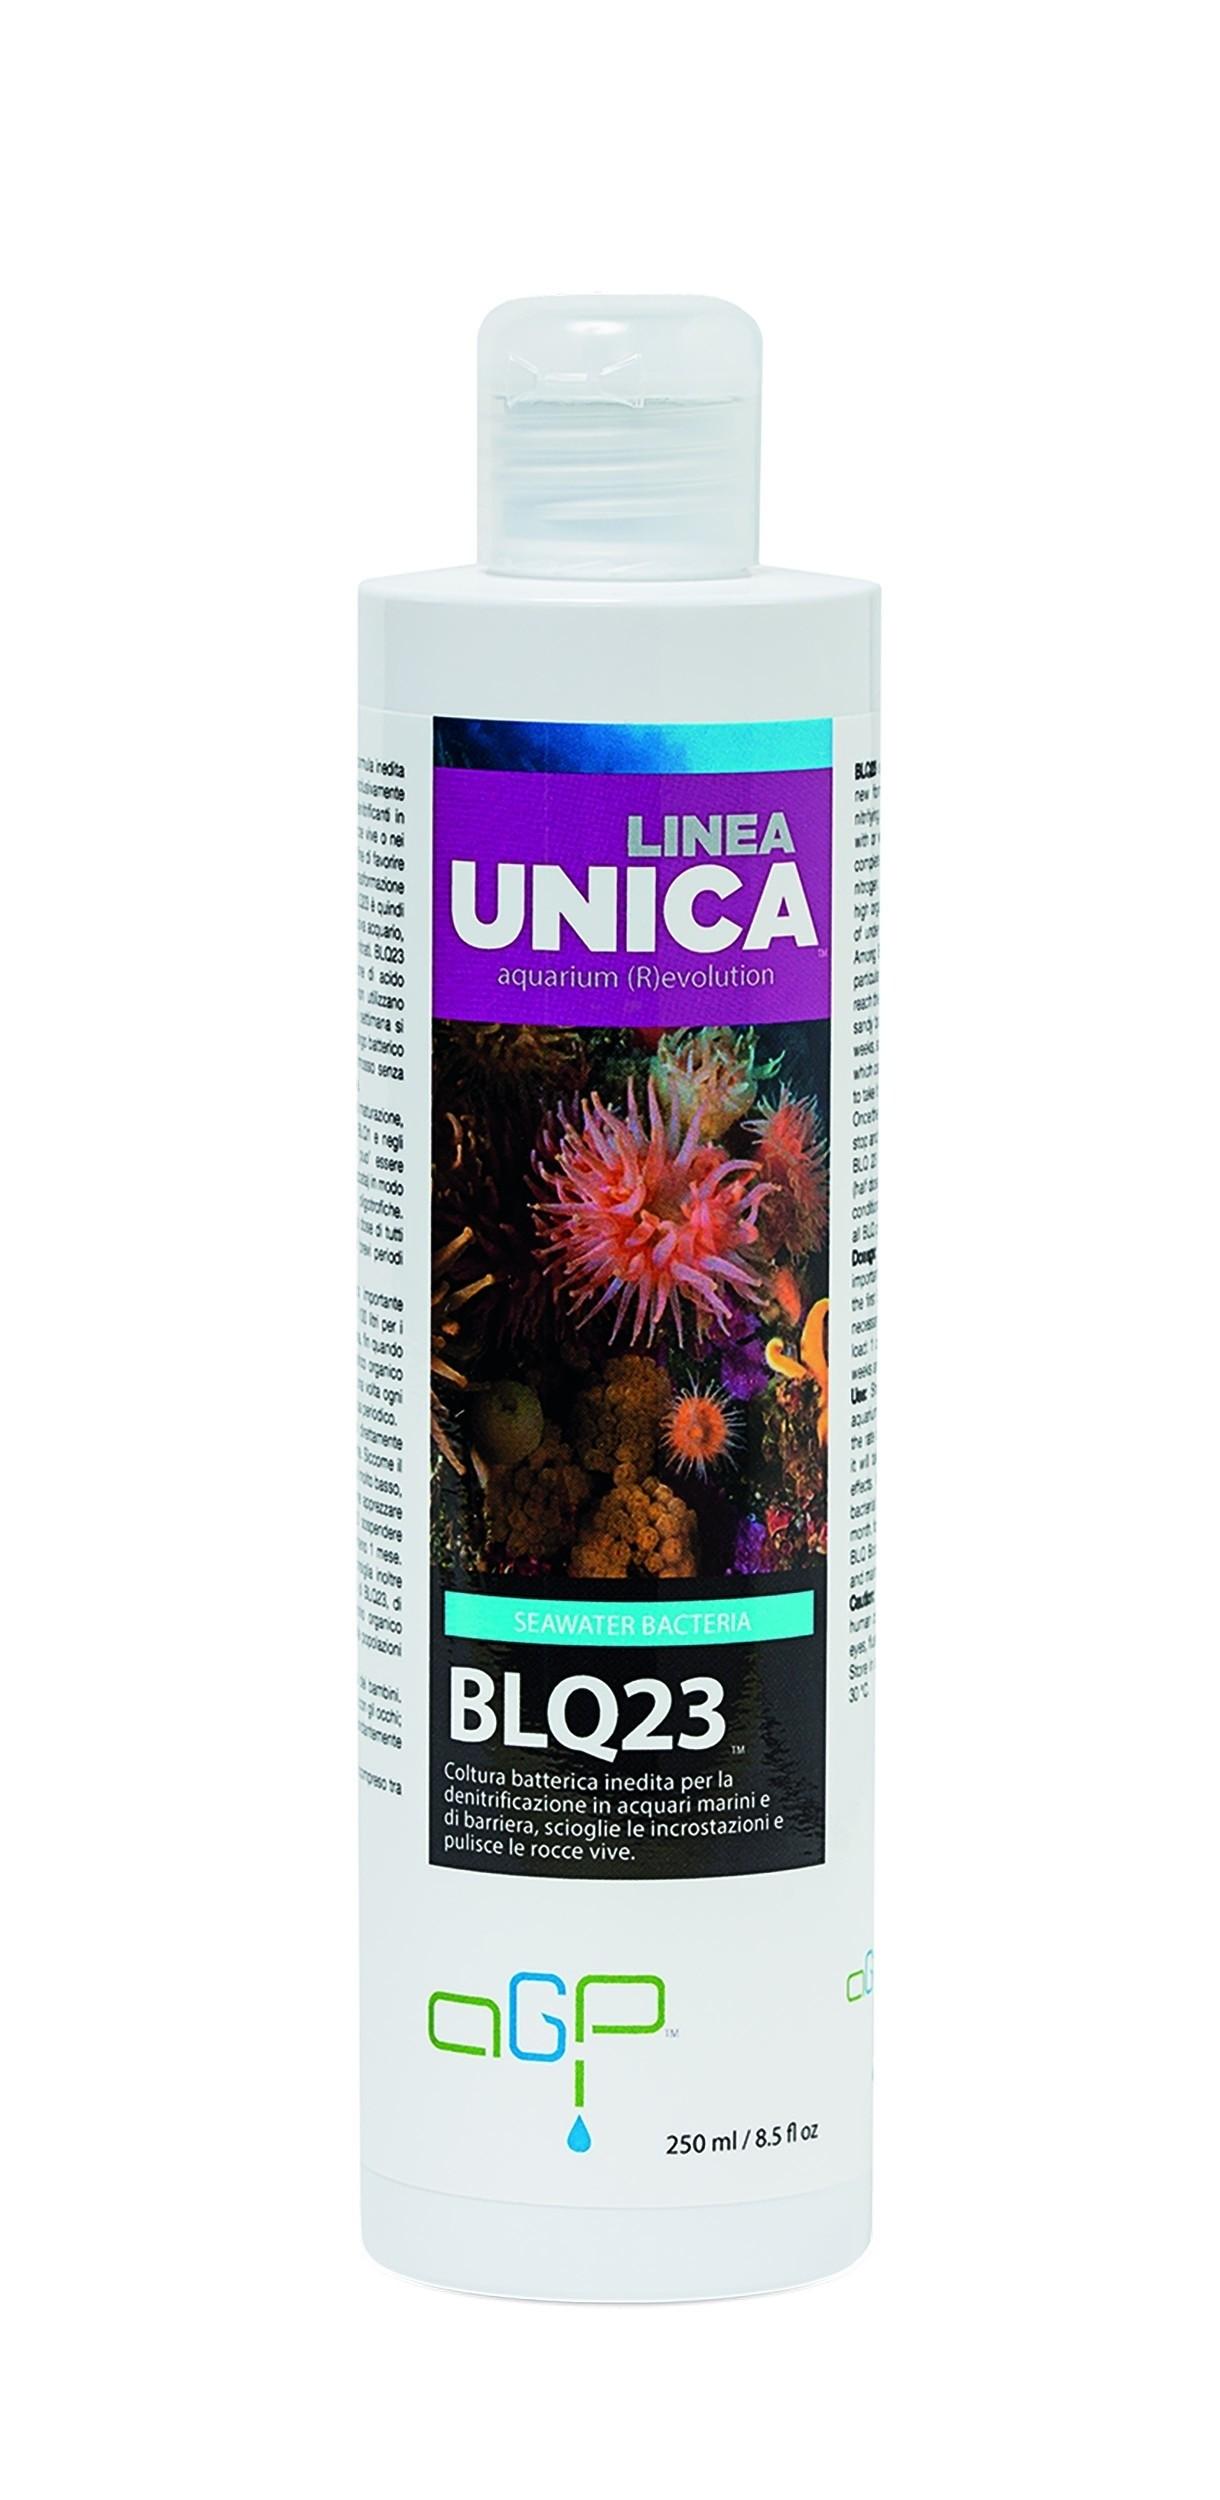 BLQ23